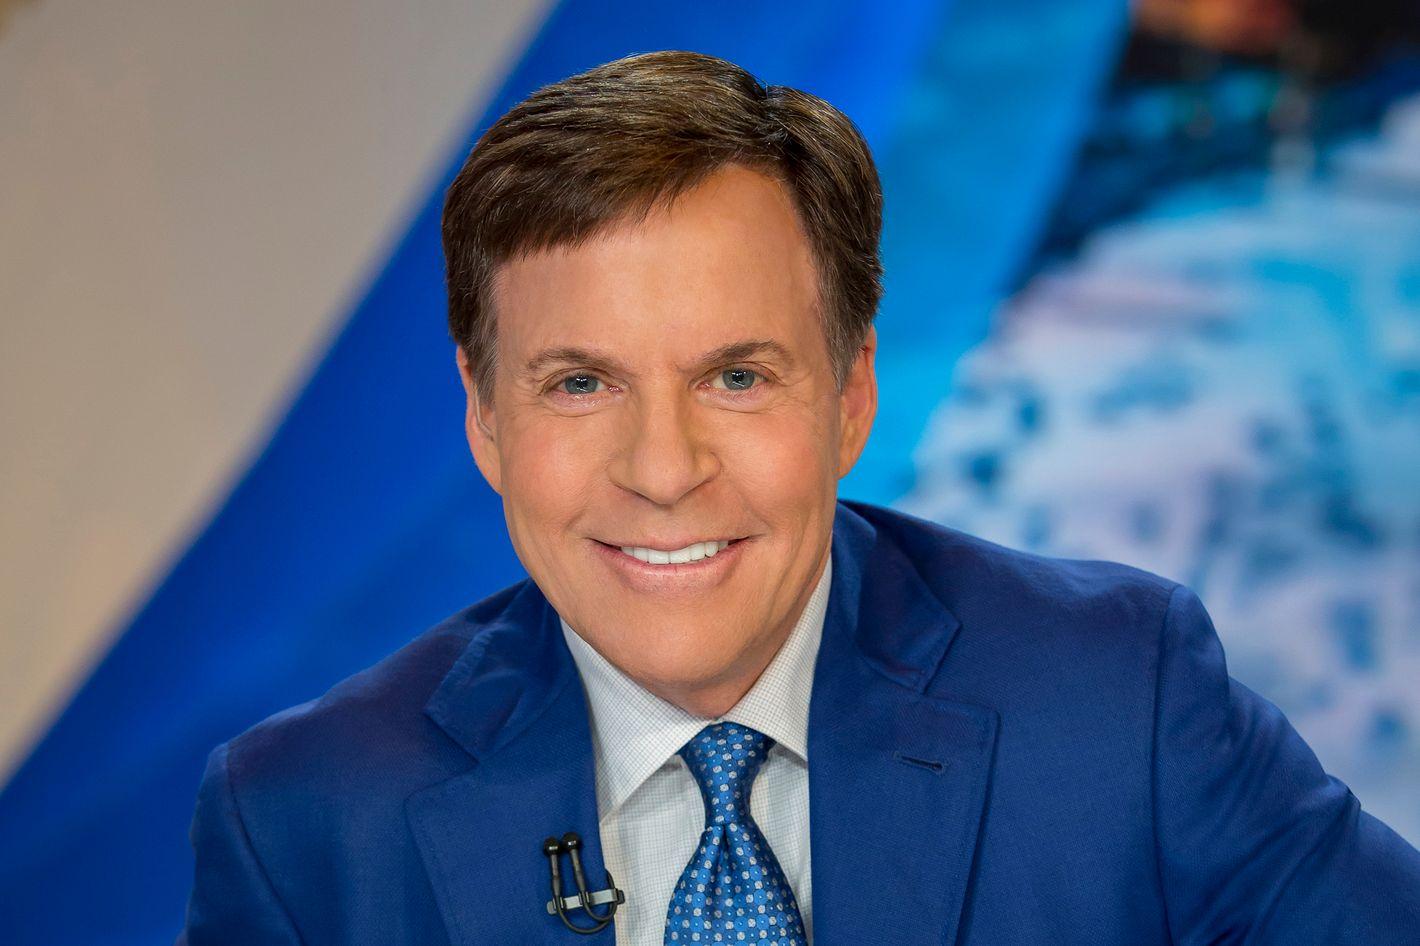 Bob Costas Will No Longer Host NBC's Olympics Coverage